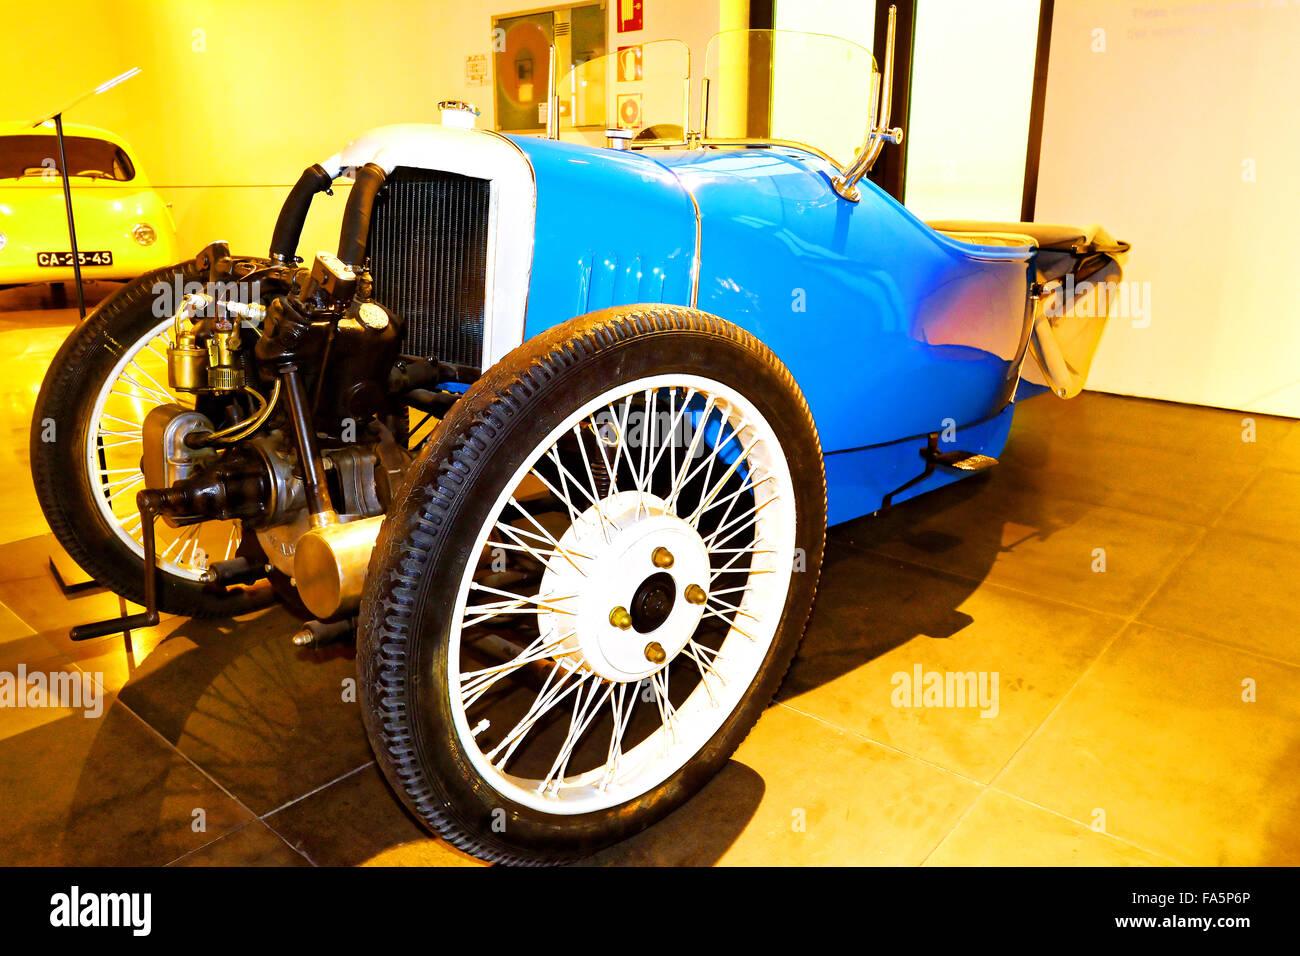 Malaga Spain Automovilistico De Malaga  Morgan Blue 3 wheeler - Stock Image